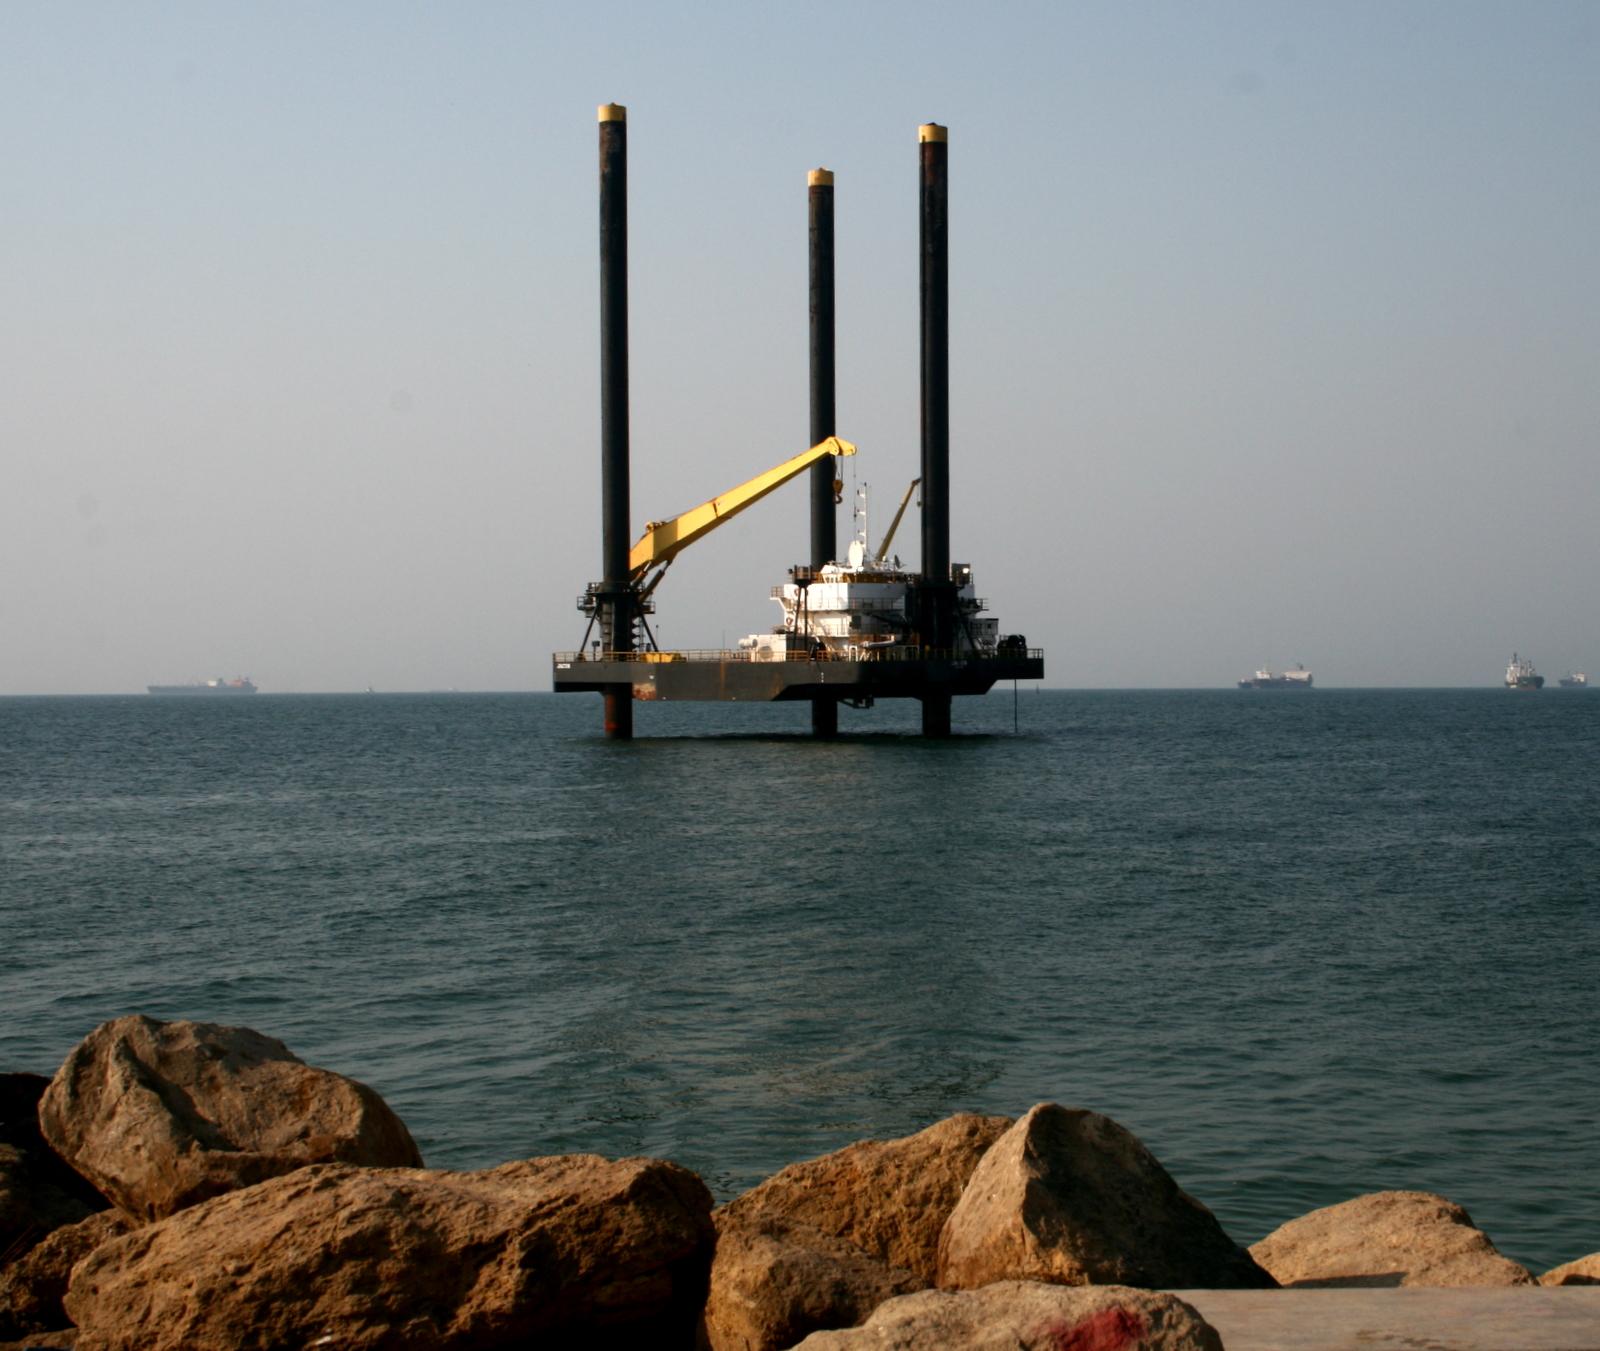 Offshore_platform_on_move_to_final_destination,_Ilha_de_Luanda